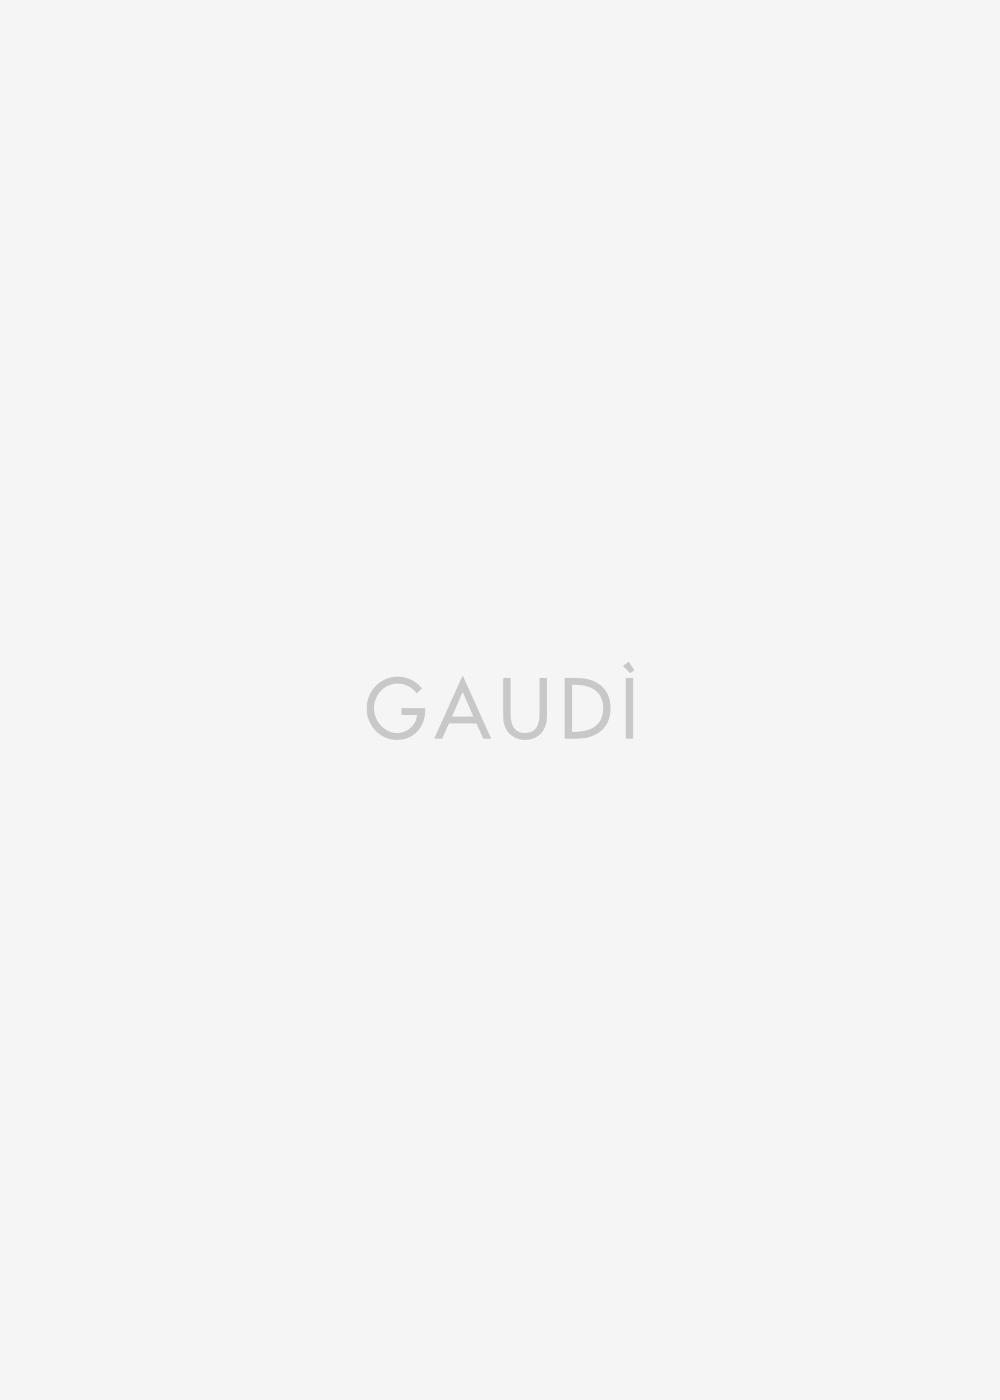 Abbigliamento 2019Gaudì Online Elegante Ss Donna Casual Ed UVpSzM